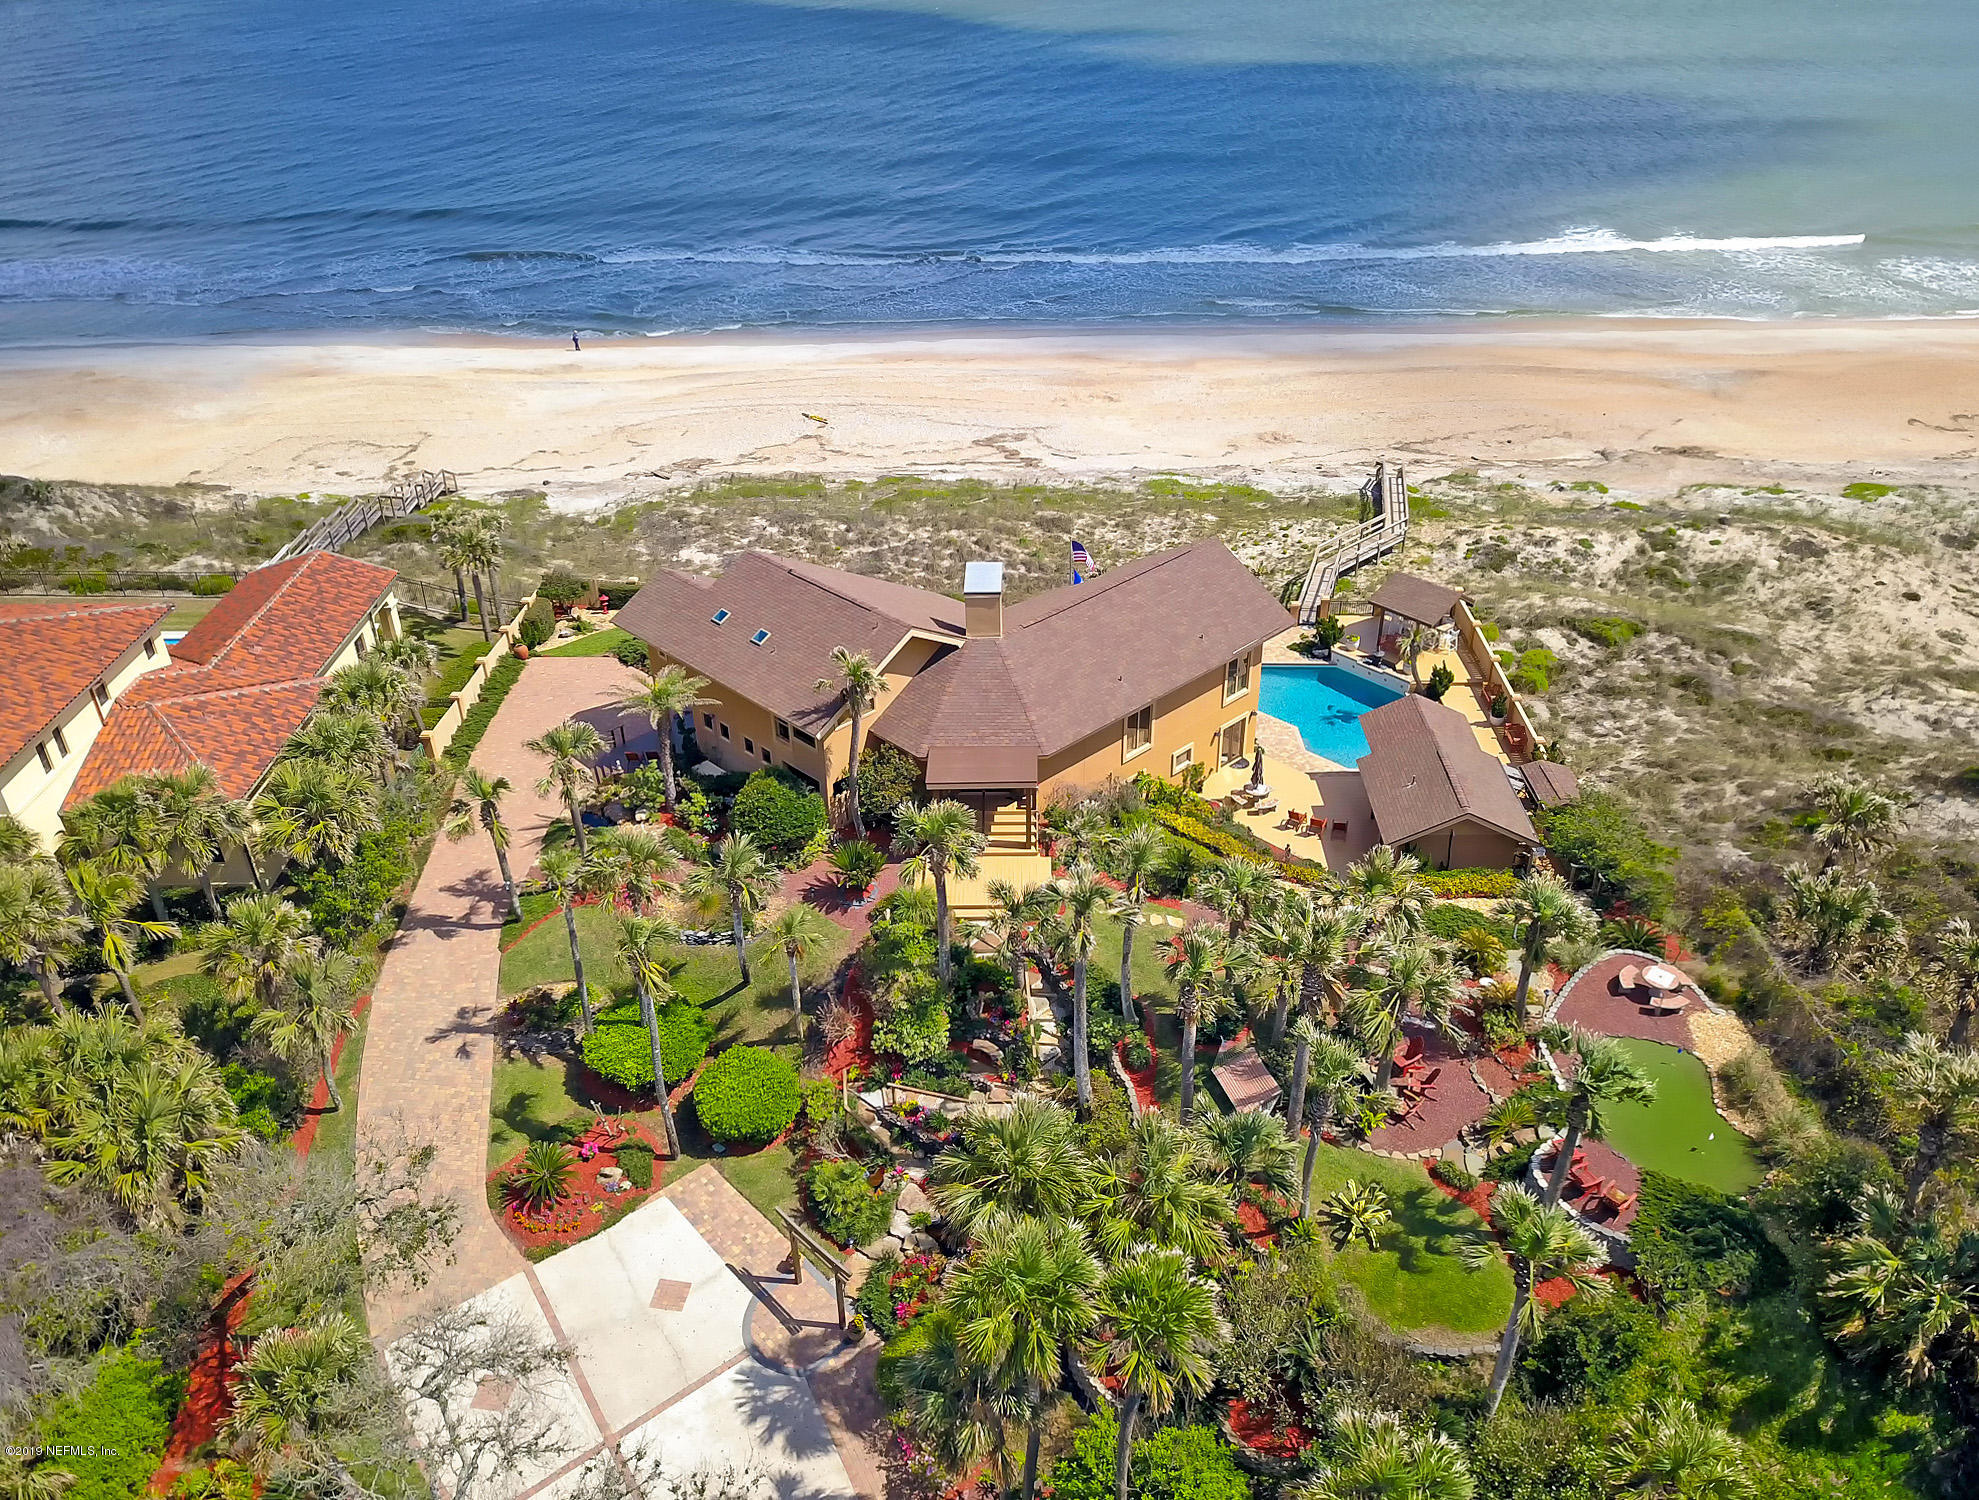 1123 PONTE VEDRA, PONTE VEDRA BEACH, FLORIDA 32082, 4 Bedrooms Bedrooms, ,3 BathroomsBathrooms,Residential,For sale,PONTE VEDRA,990358